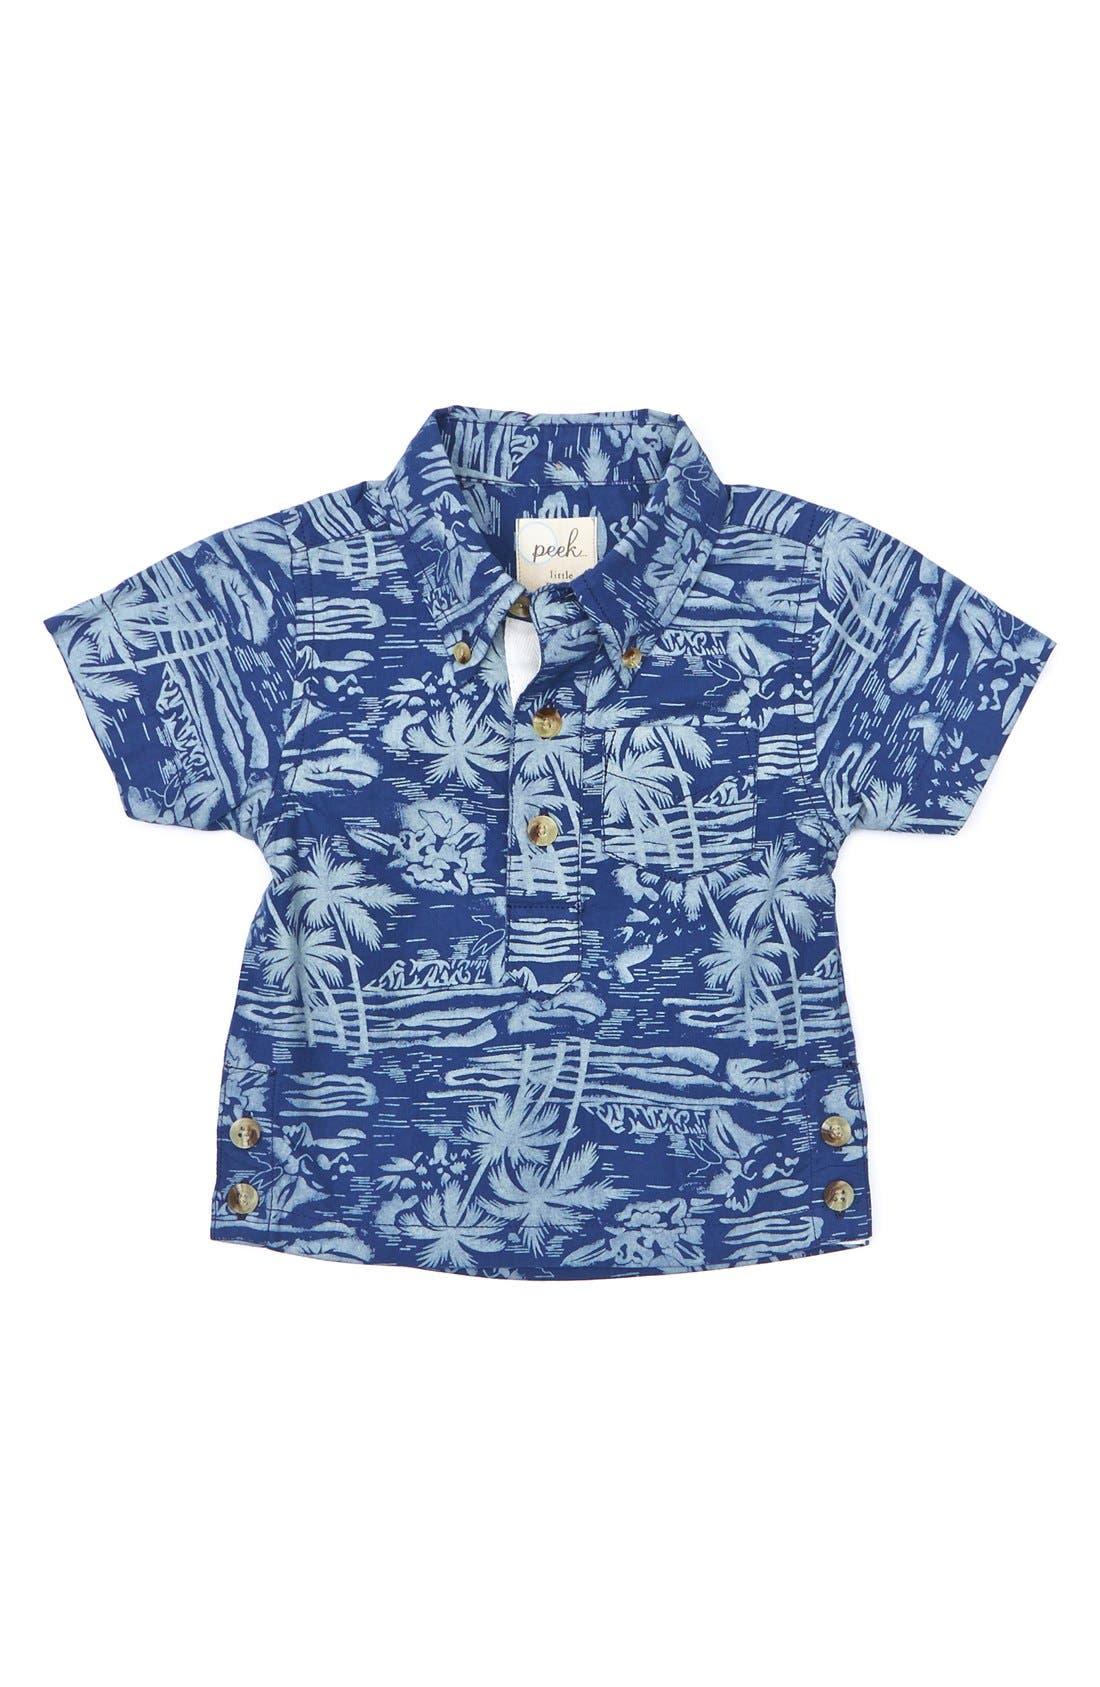 Alternate Image 1 Selected - Peek 'North Shore' Shirt (Baby Boys)